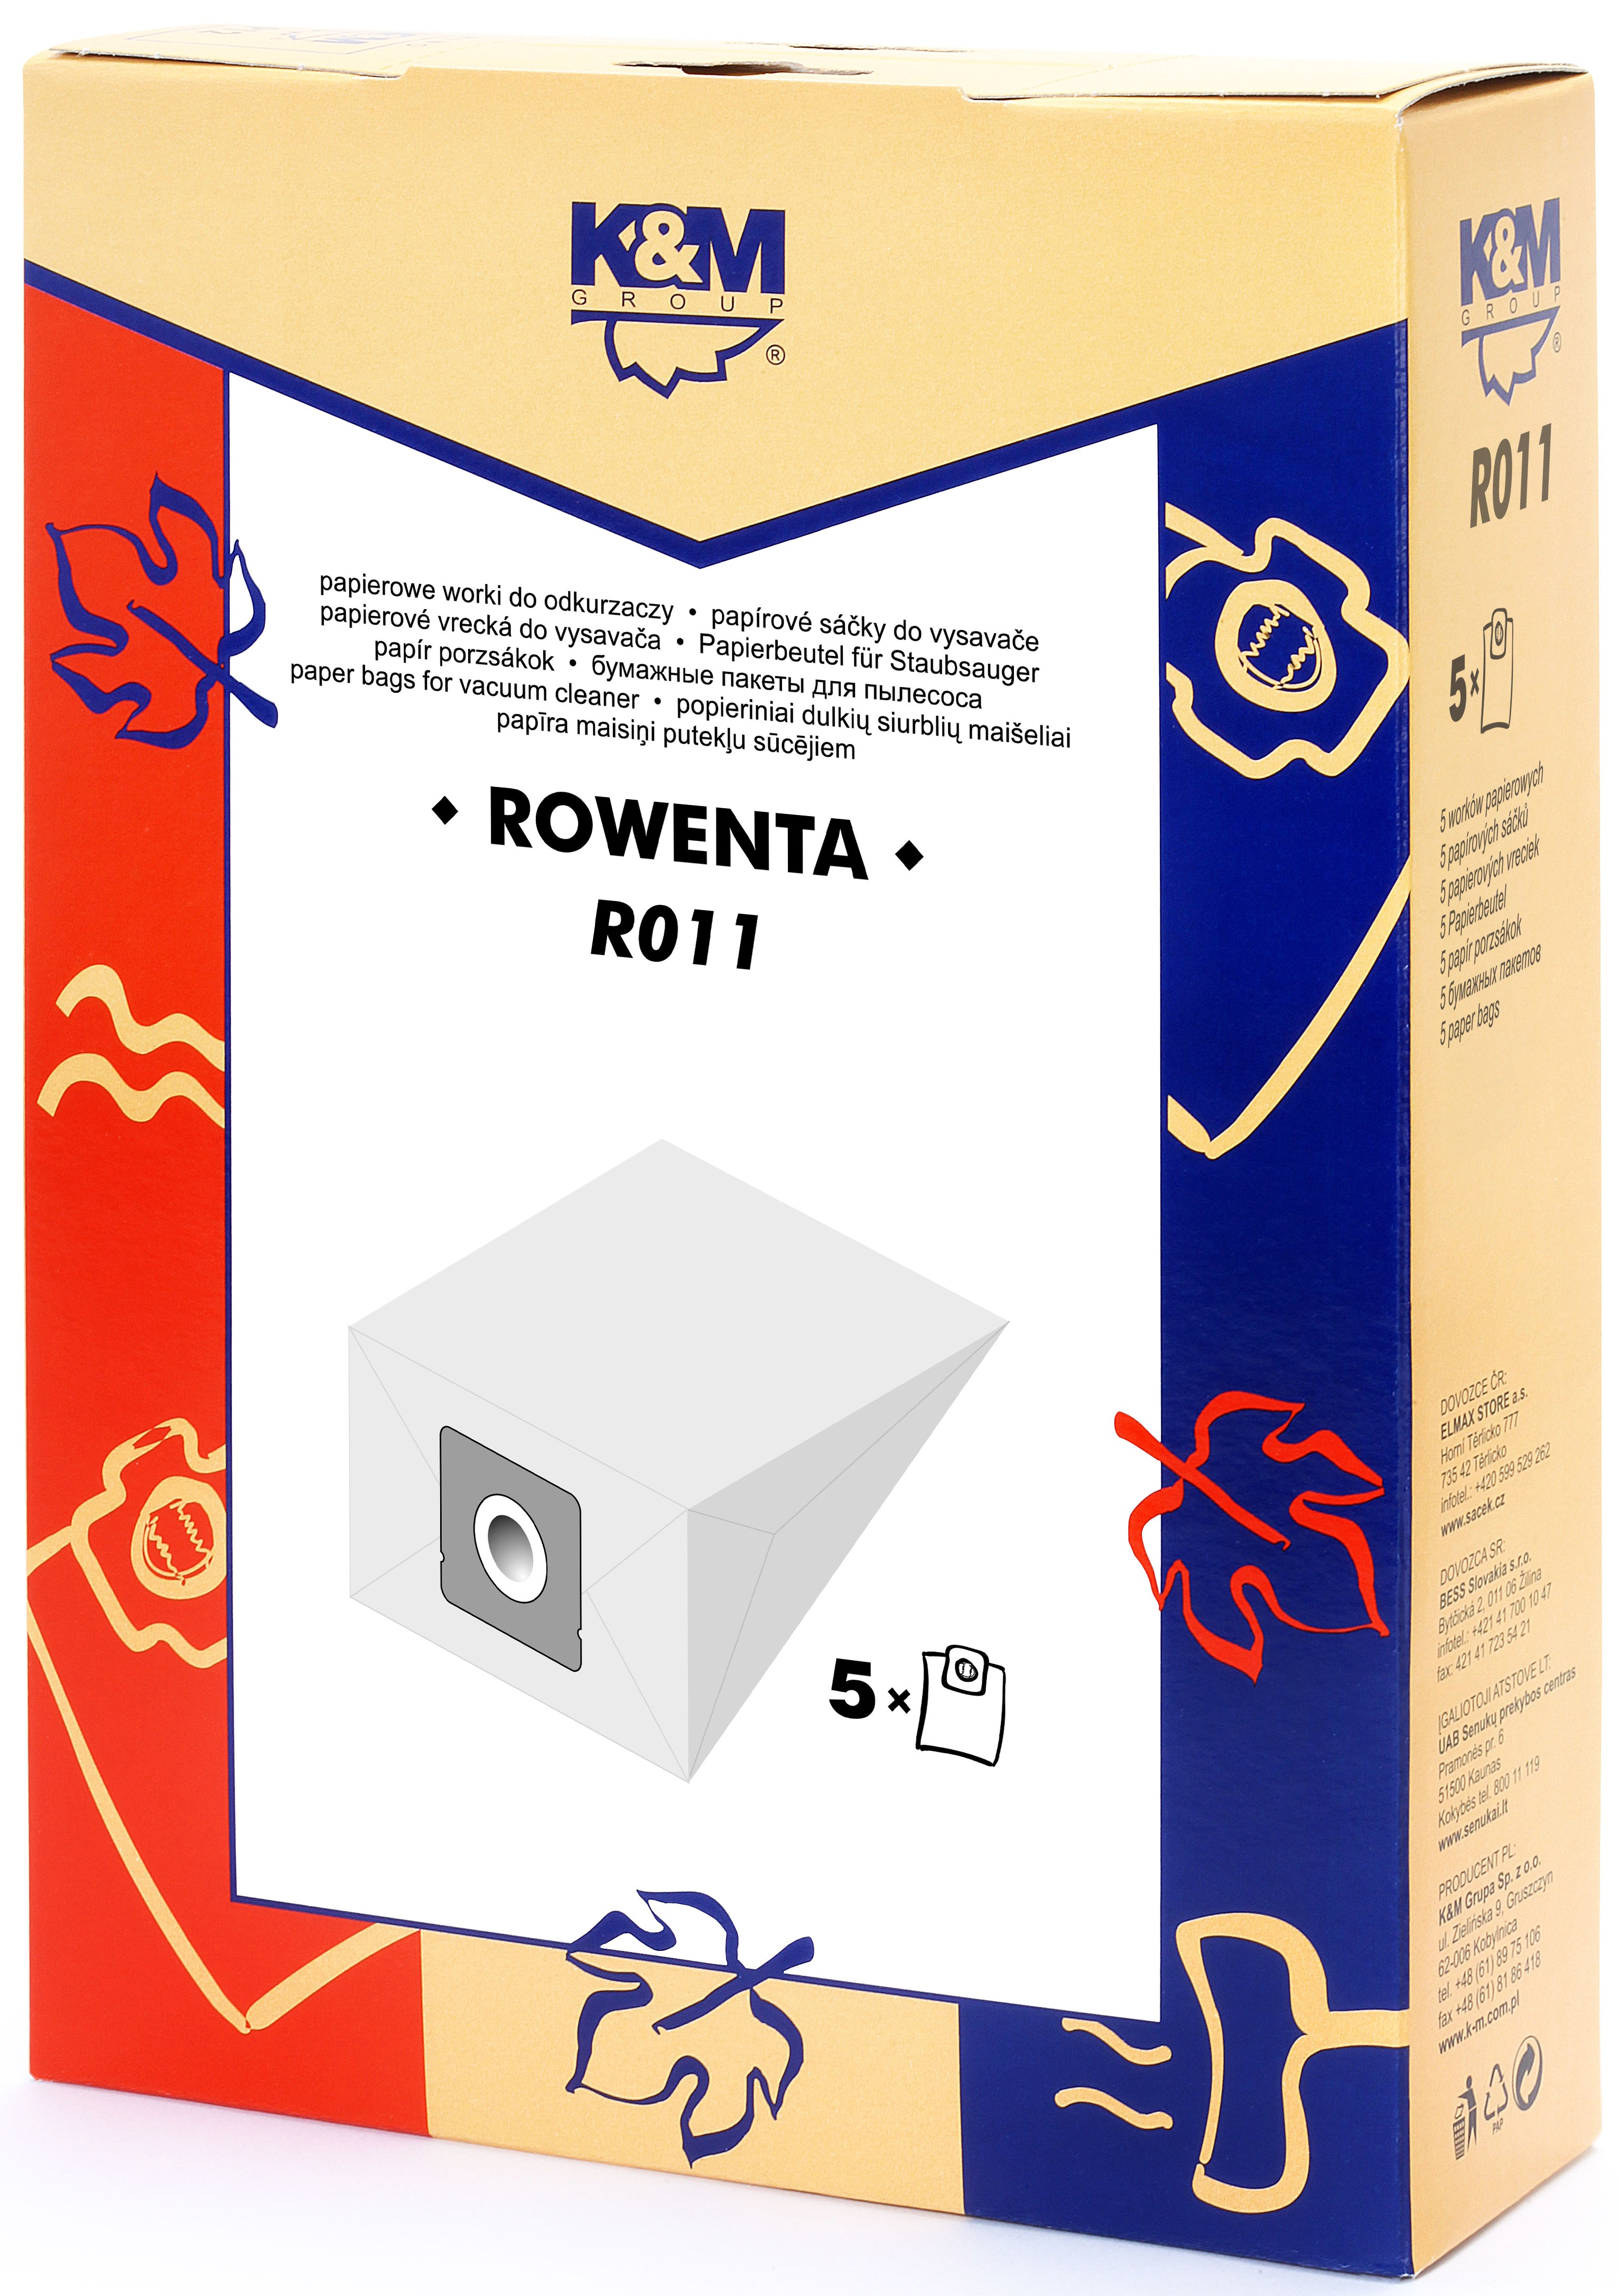 Sac aspirator Rowenta ZR 17, hartie, 5X saci, K&M 0